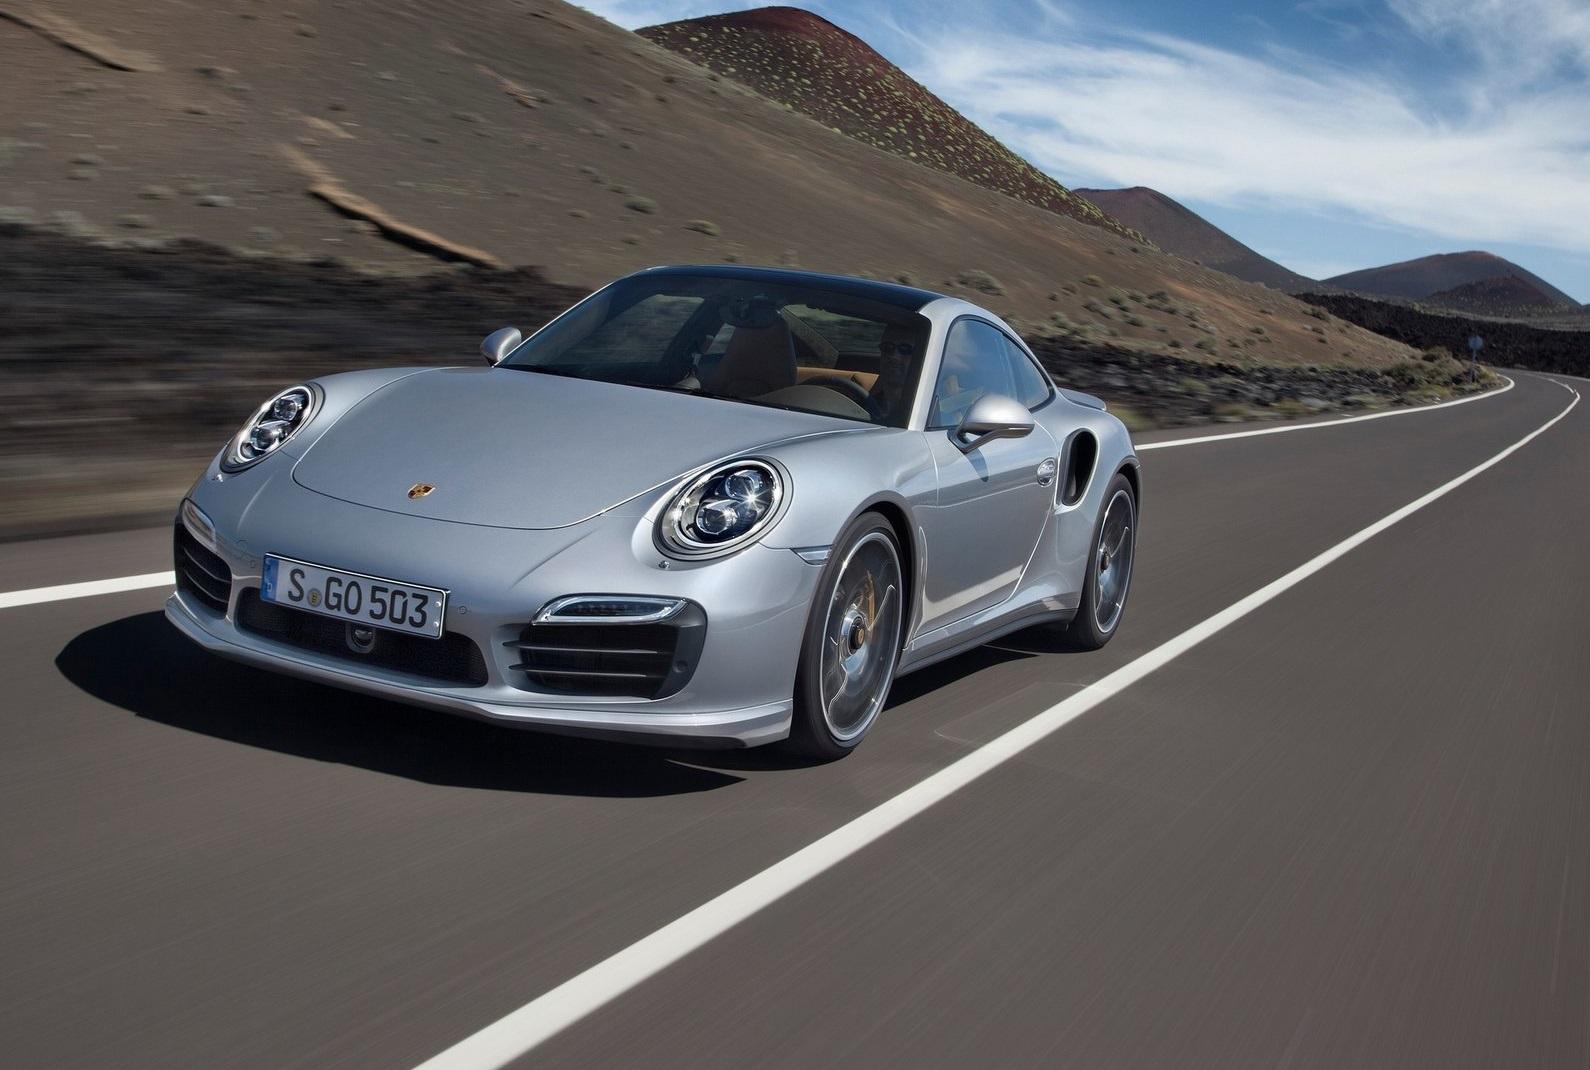 Porsche-911_Turbo_S_2014_1